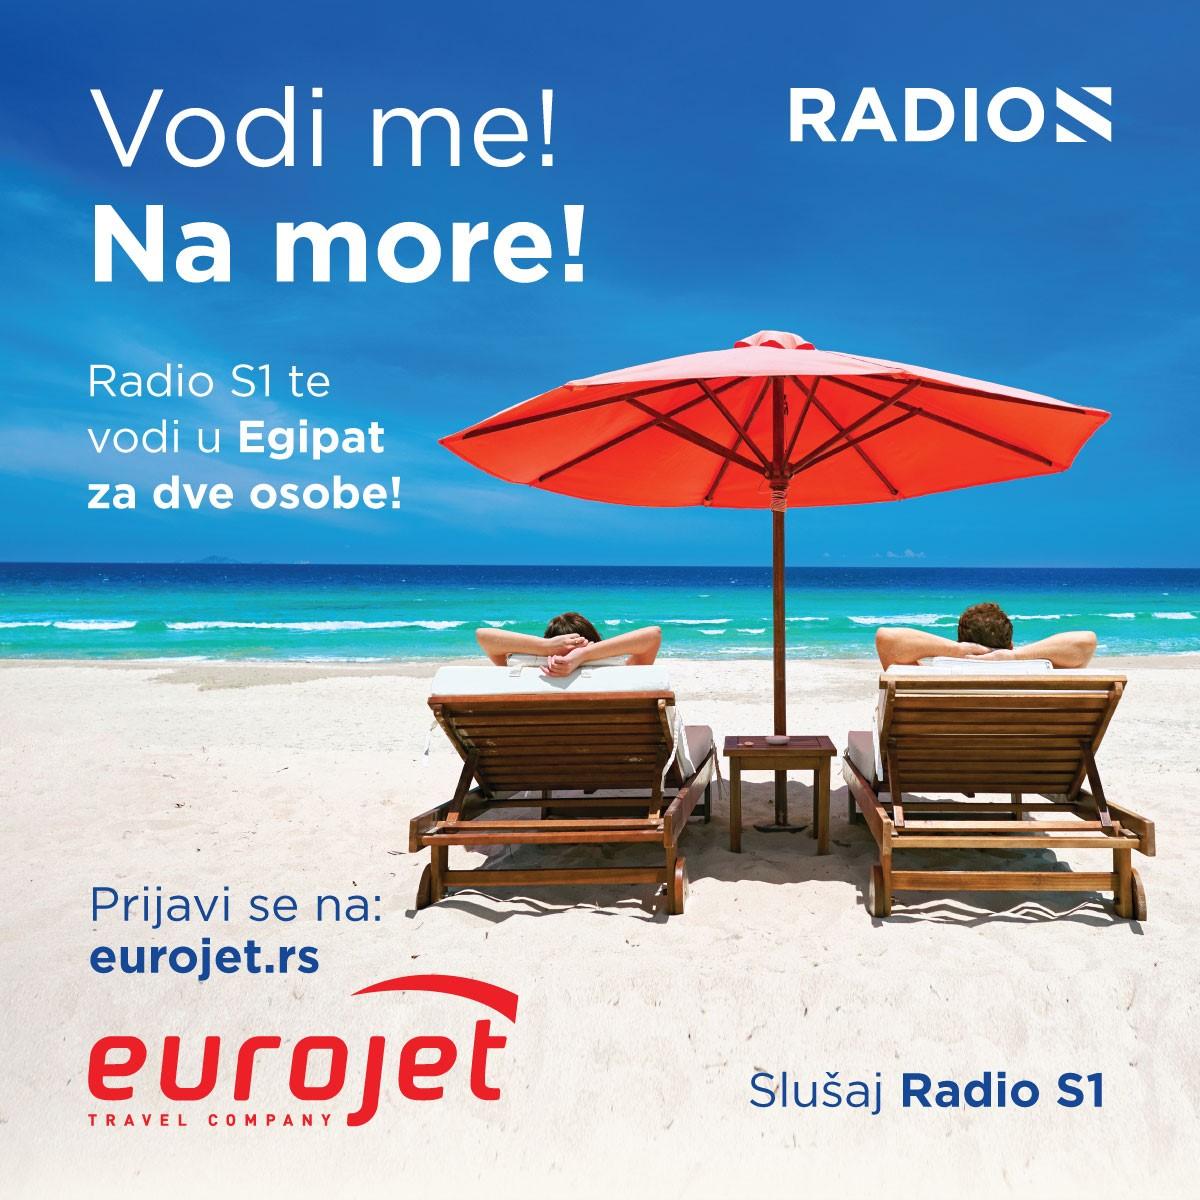 Radio S! Vodi me na more!